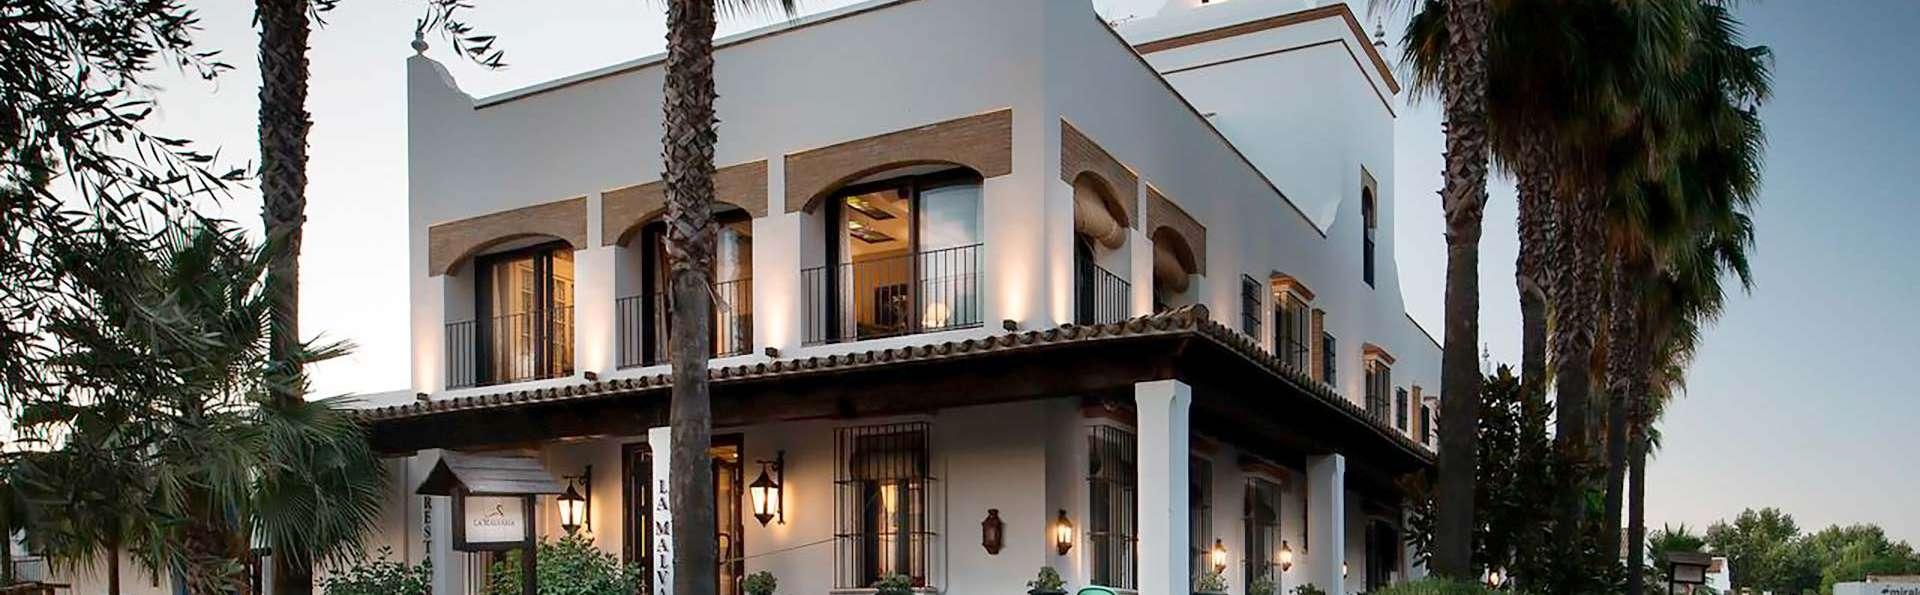 La Malvasia Hotel - EDIT_FRONT_01.jpg